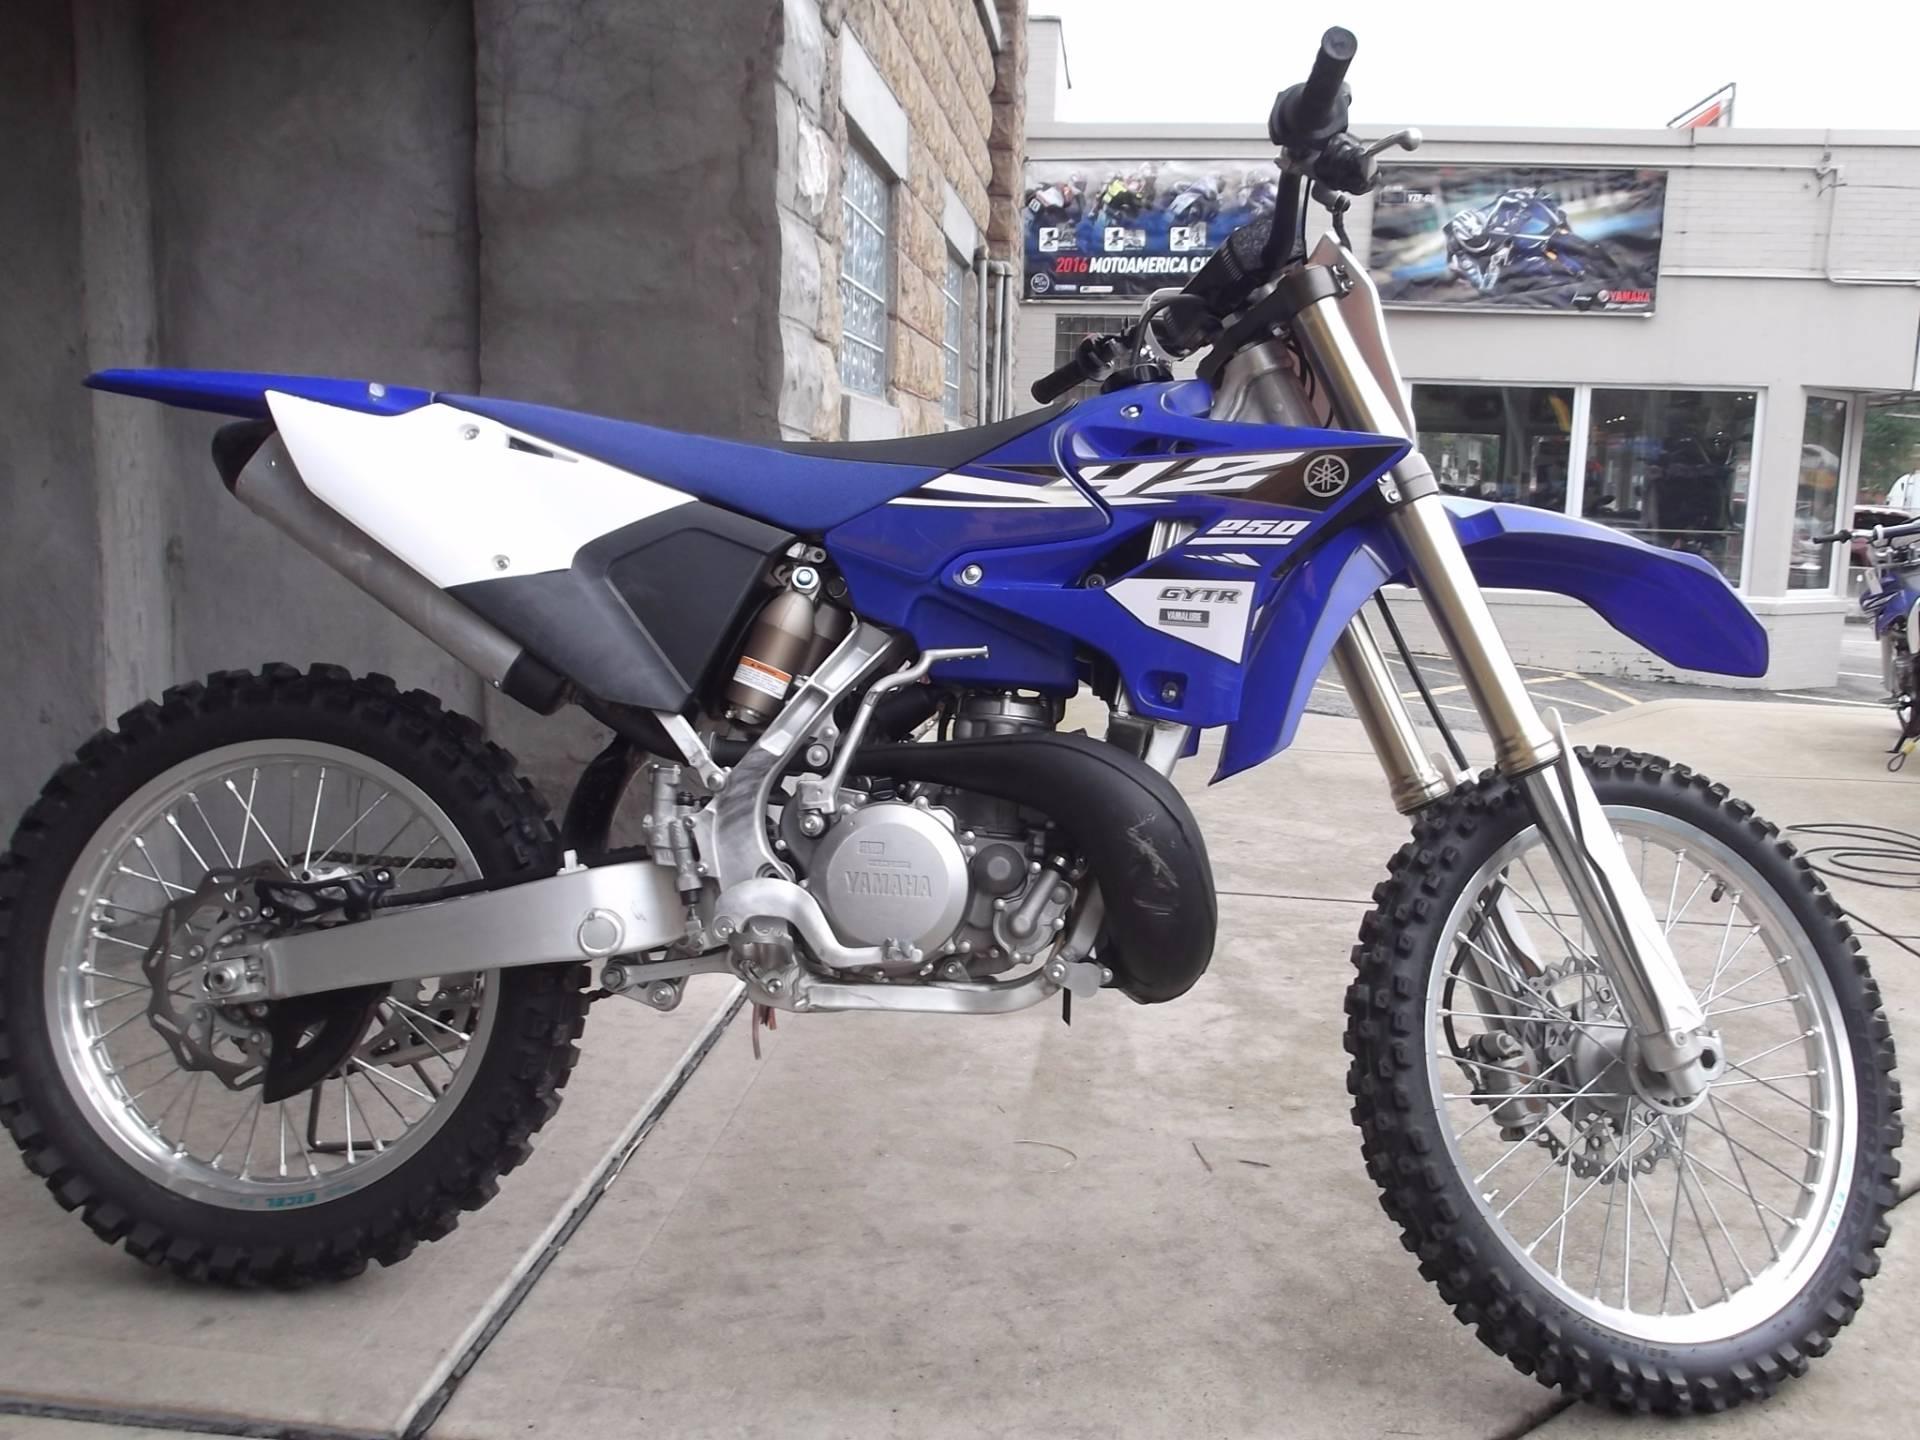 Dirt bikes for sale pittsburgh pa - 2015 Yamaha Yz250 In Pittsburgh Pennsylvania